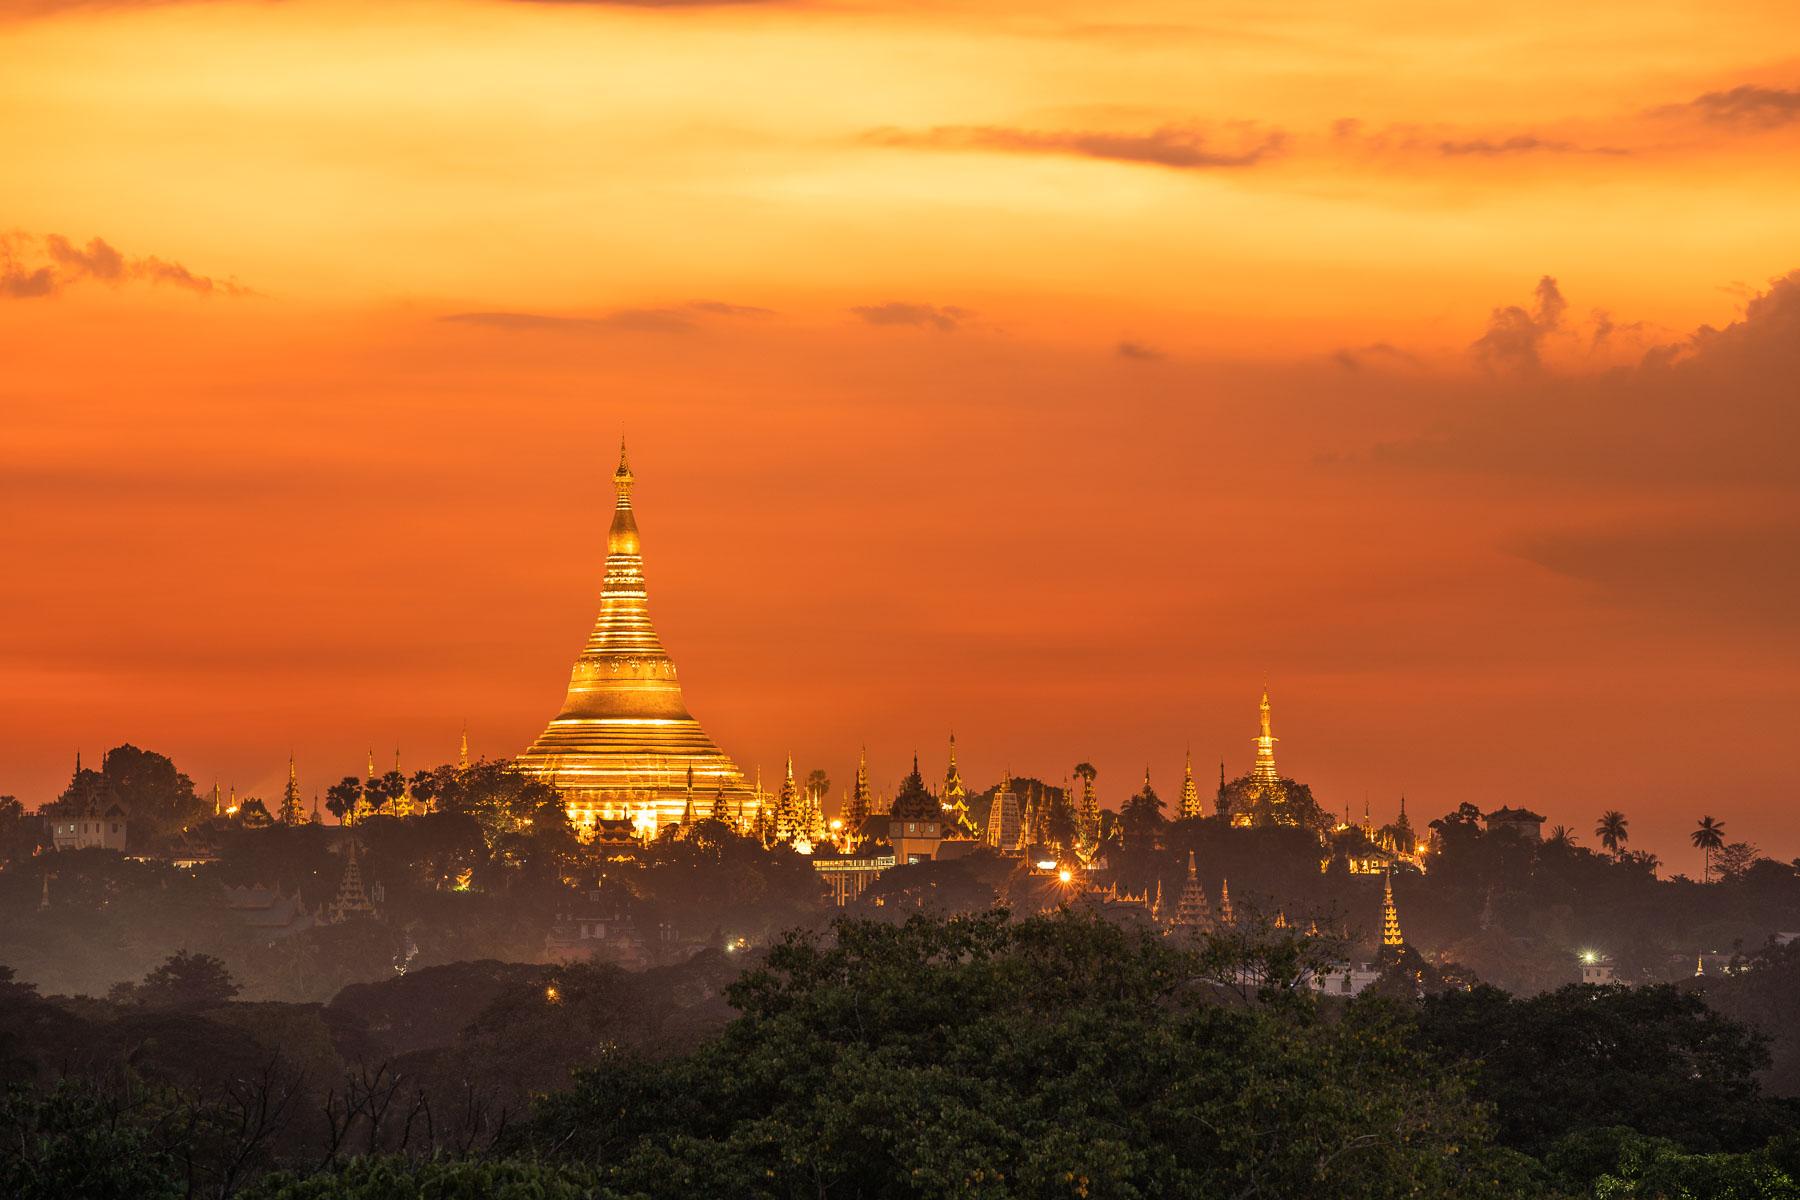 Christian Meixner Fotografie, Fotograf Zürich, Myanmar, Yangon, Shwedagon Pagoda, Reisen, Reisefotografie